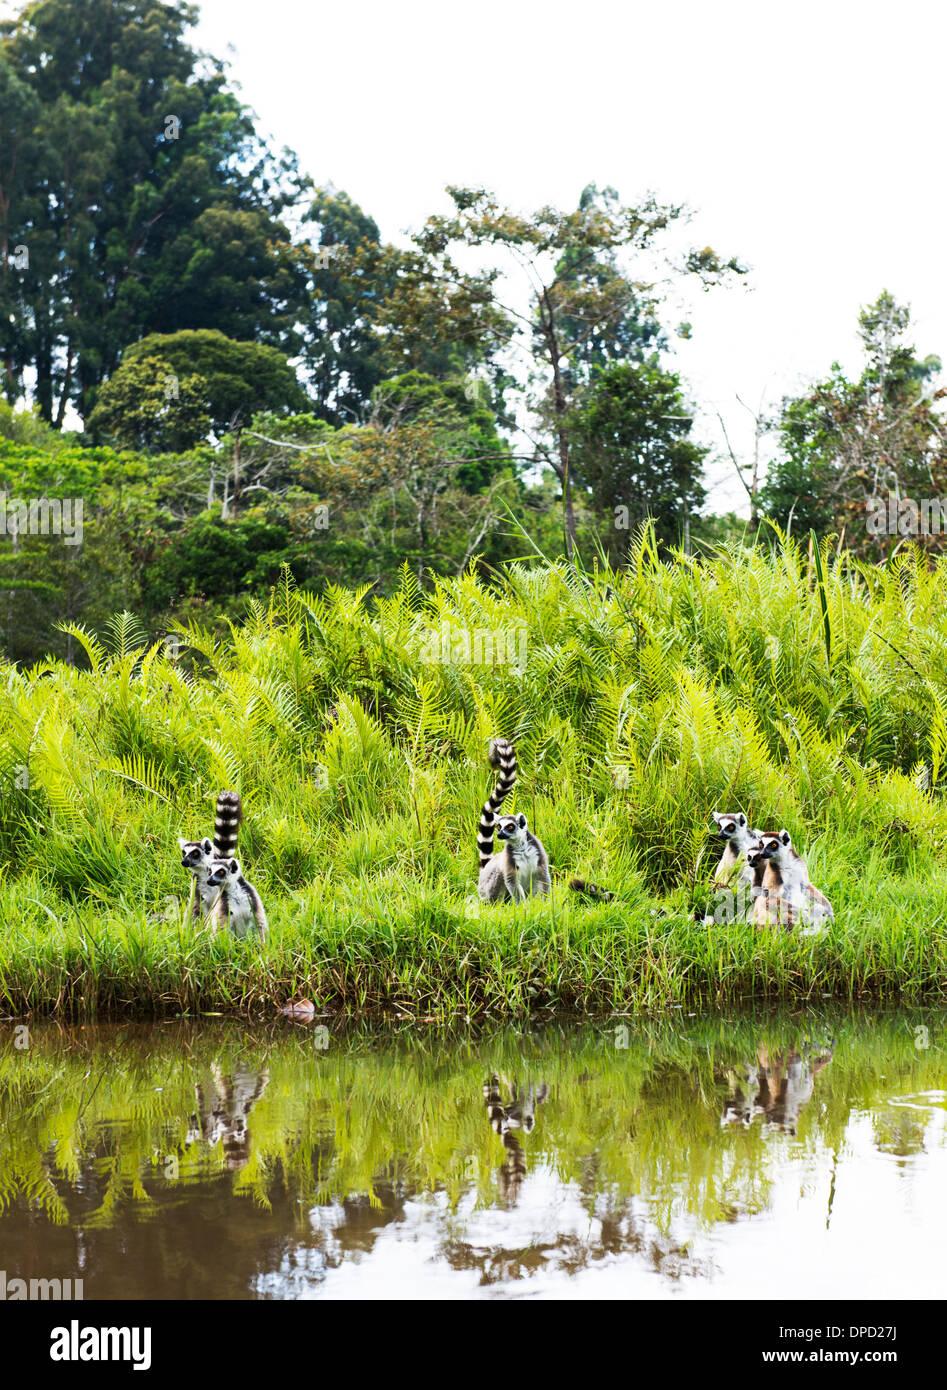 Ring Tailed Lemurs in Madagascar. - Stock Image